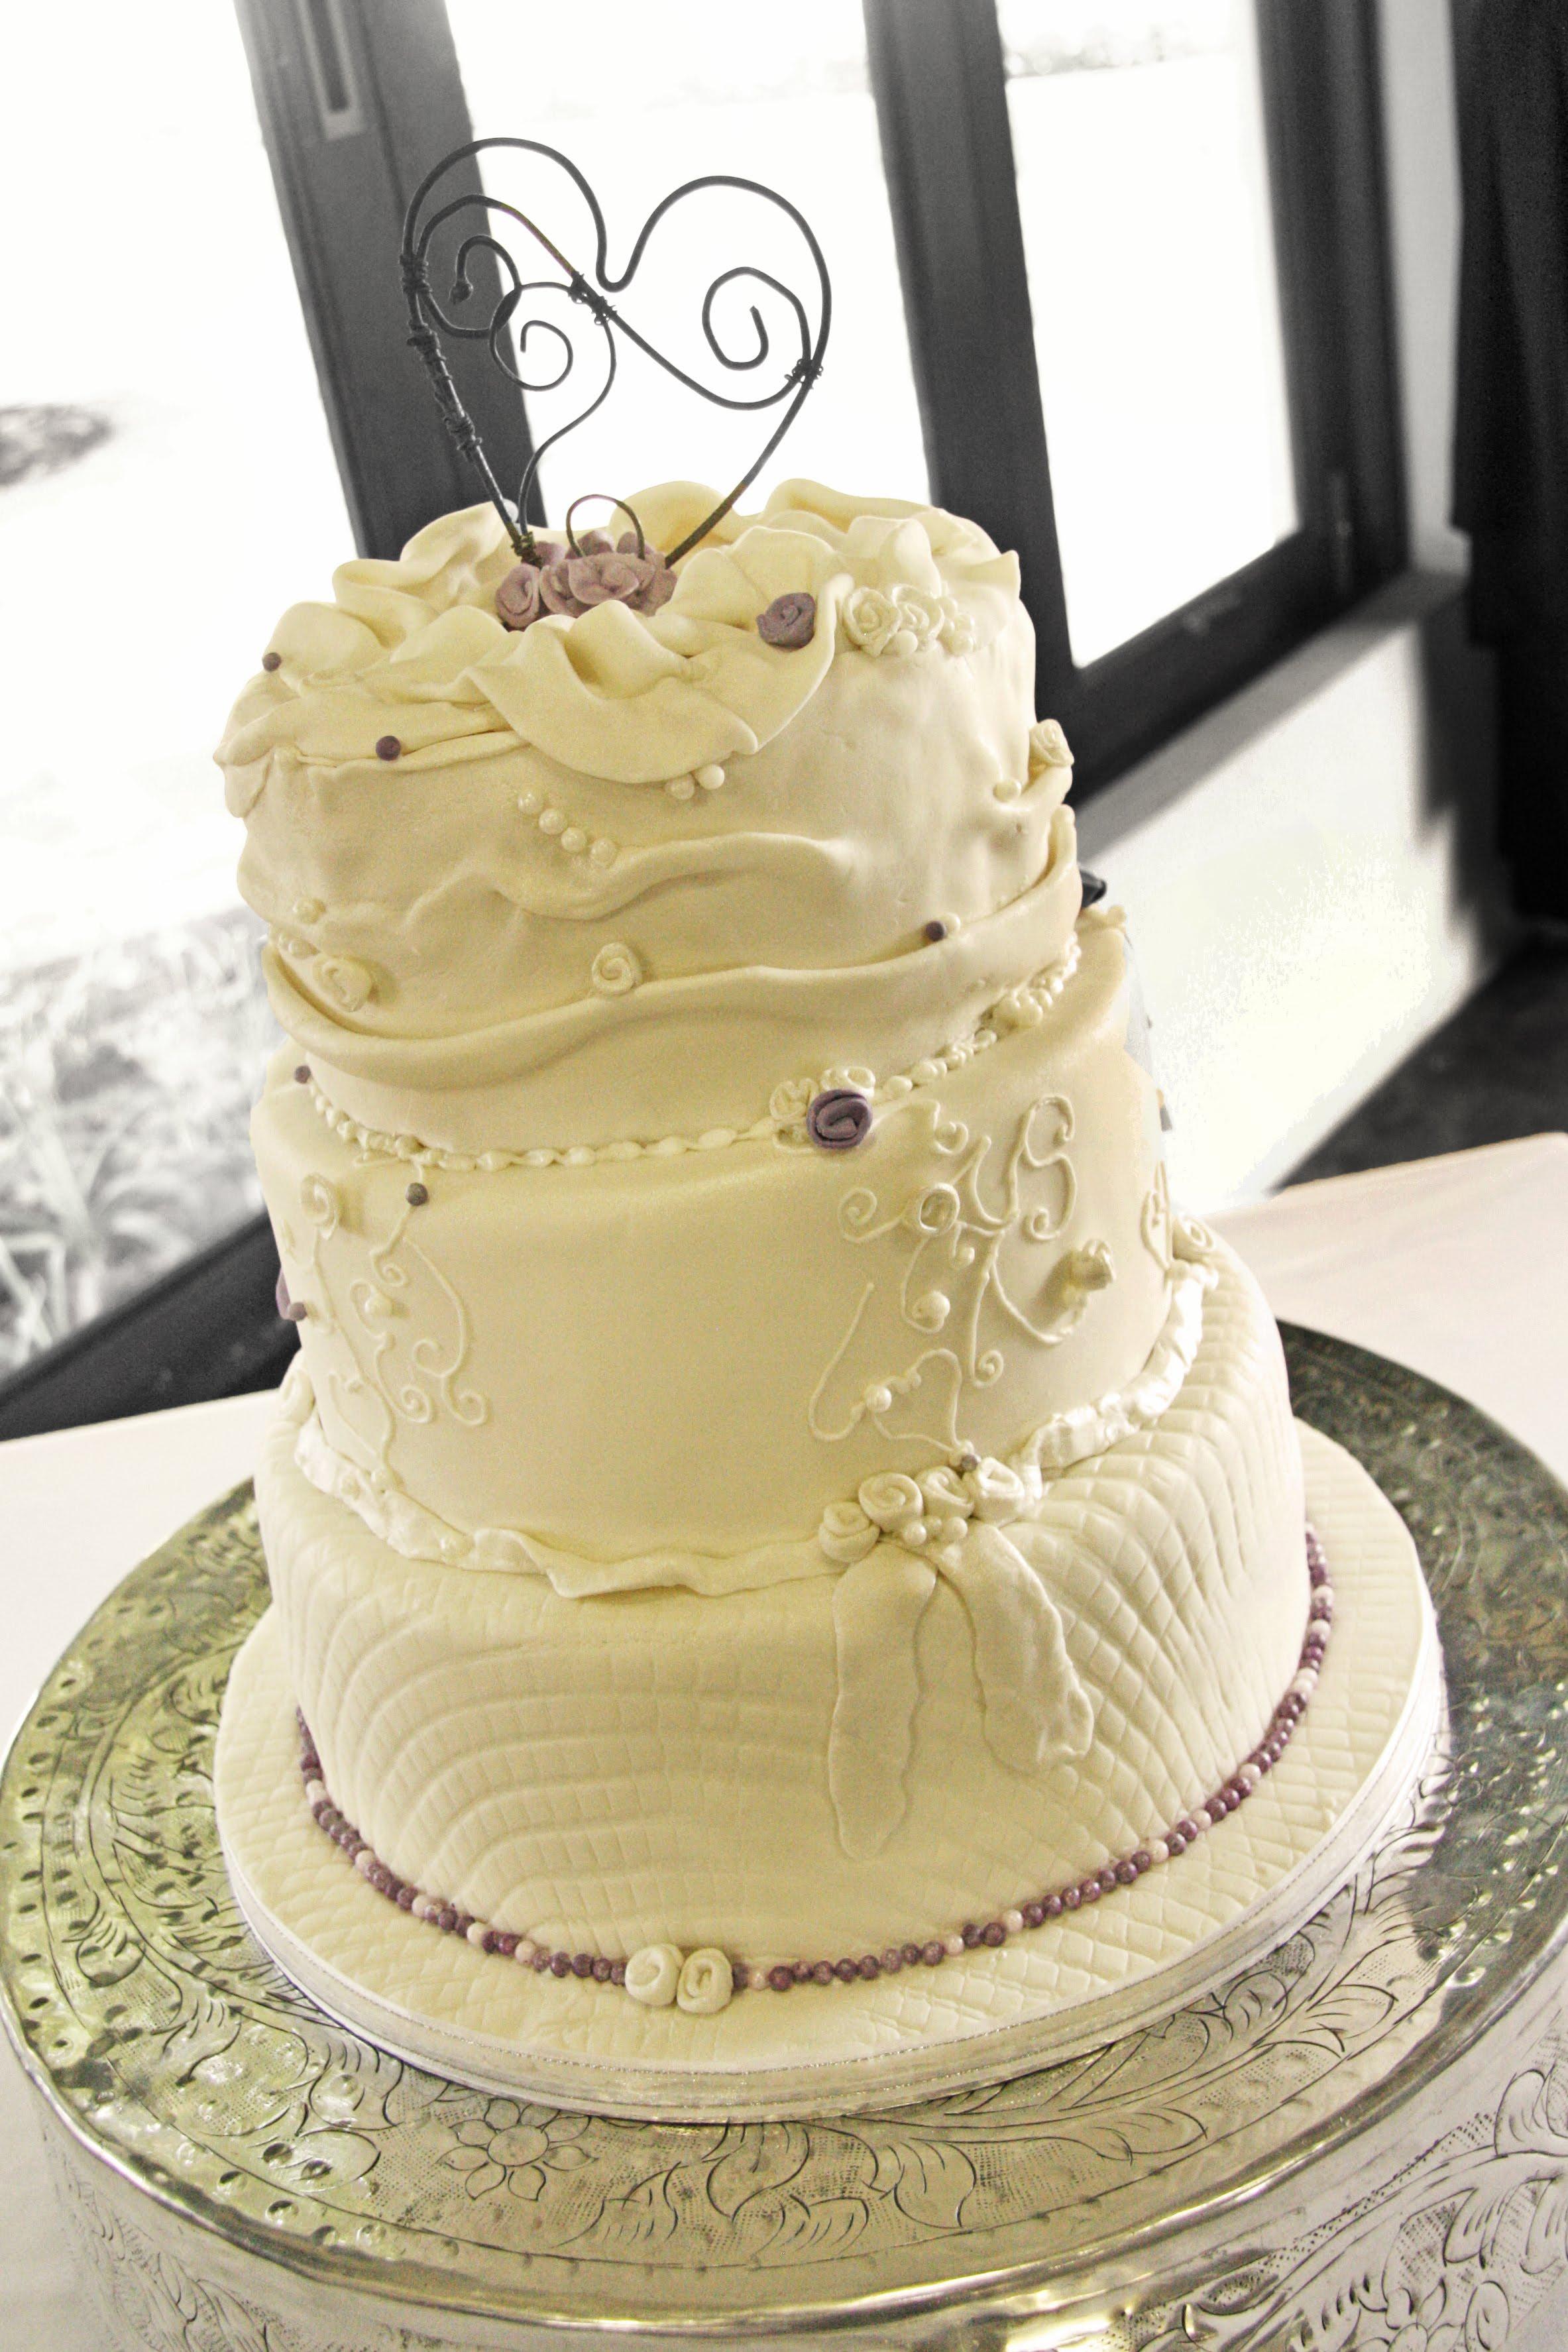 3 Tier Wedding Cakes 85 Luxury At Chocodreamcakes we make